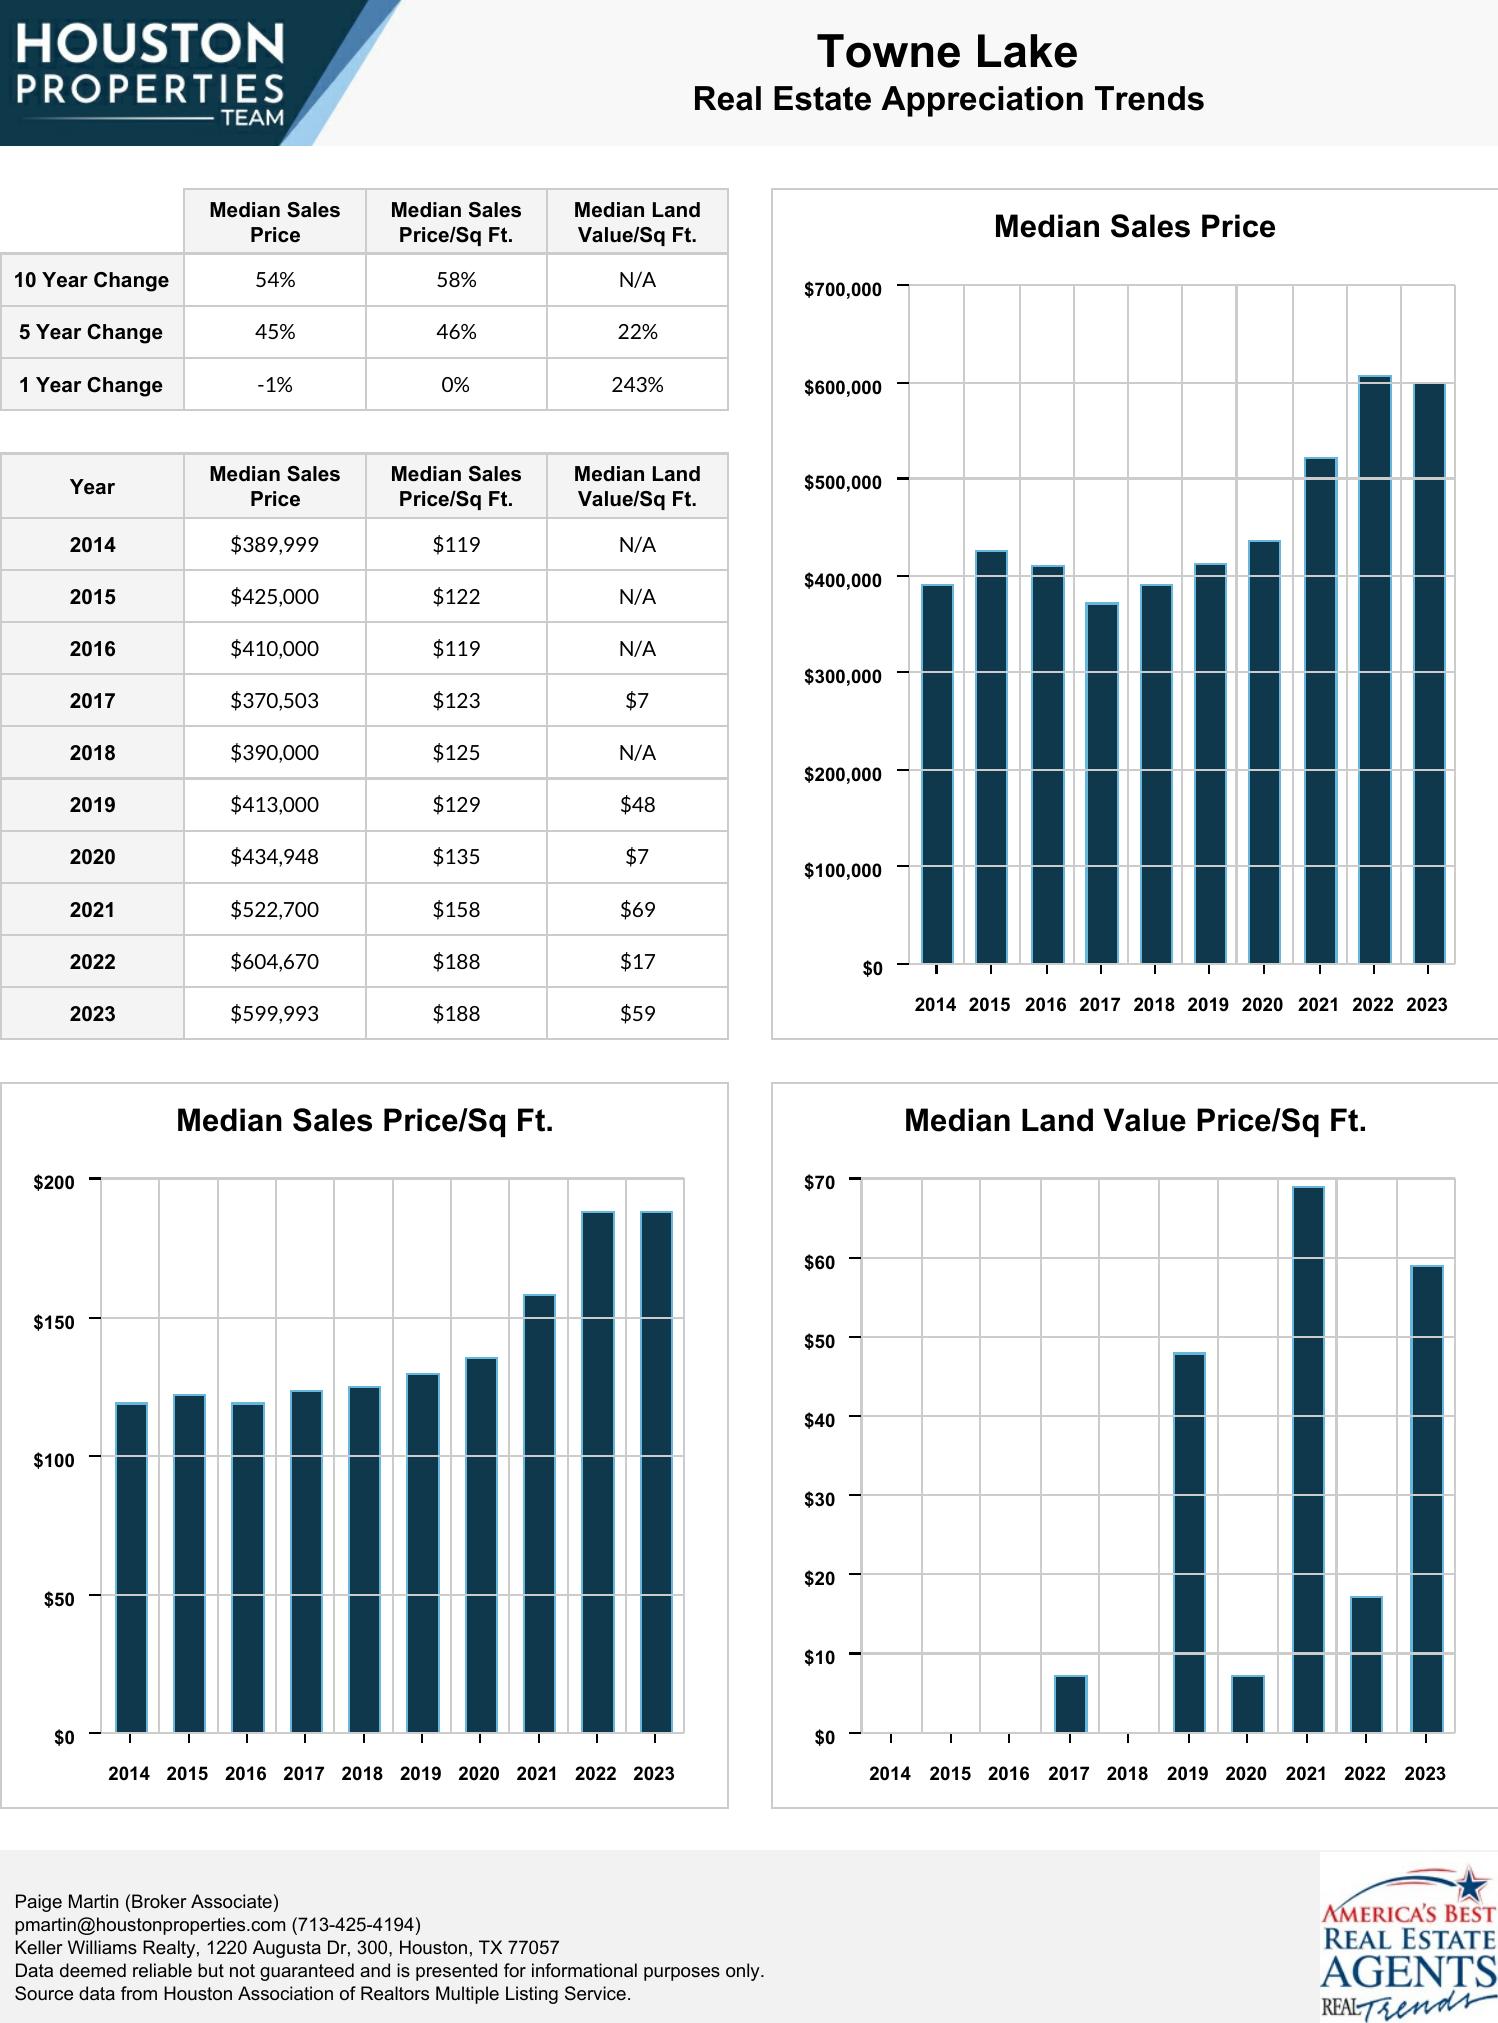 Towne Lake Real Estate Trends